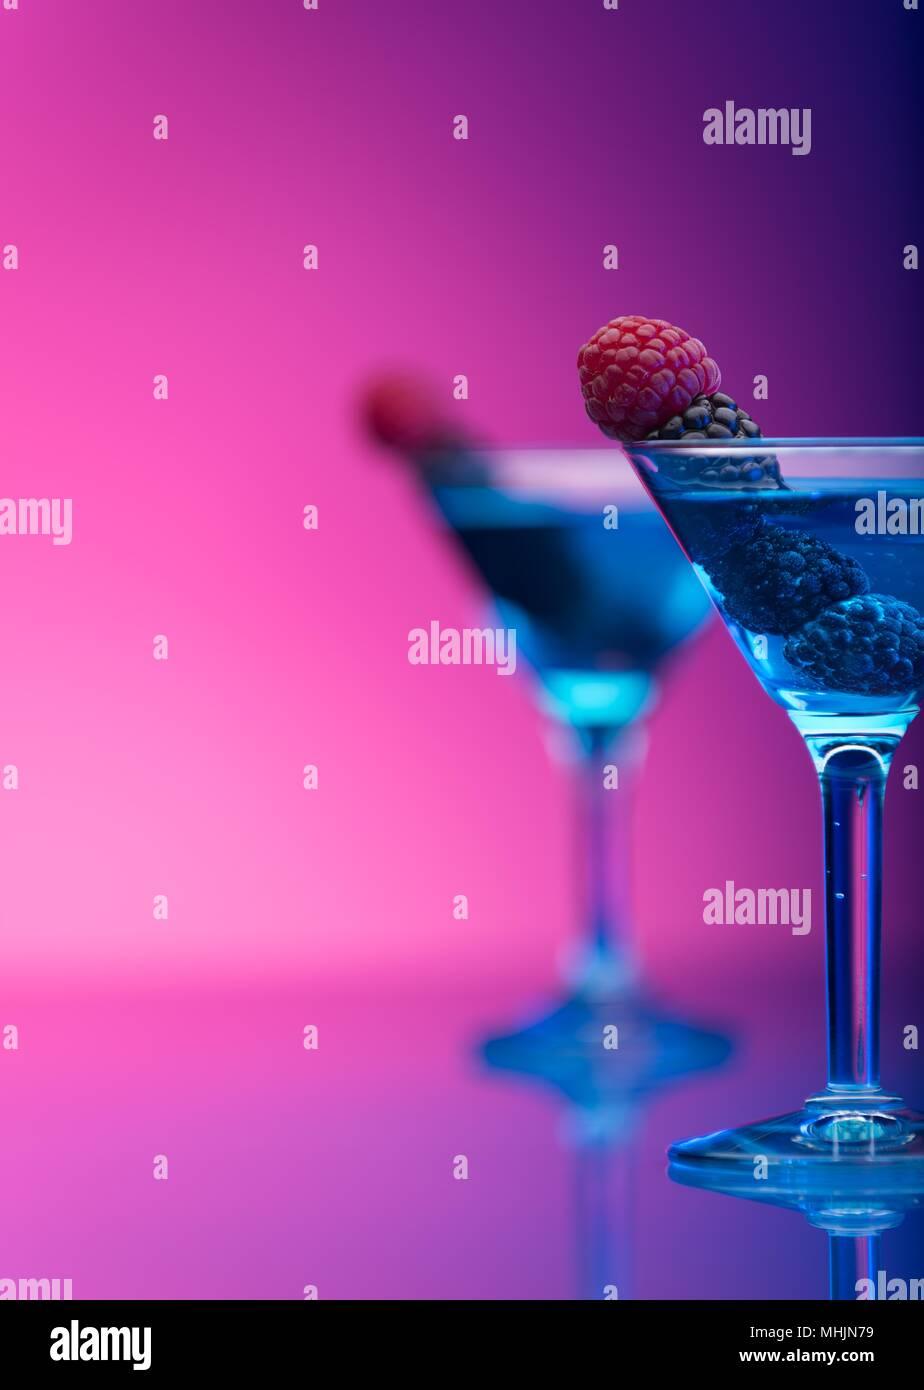 Close-Up Of Wine Glasses Against Black Background  Beer - Alcohol   Cocktail Blended Drink - Stock Image